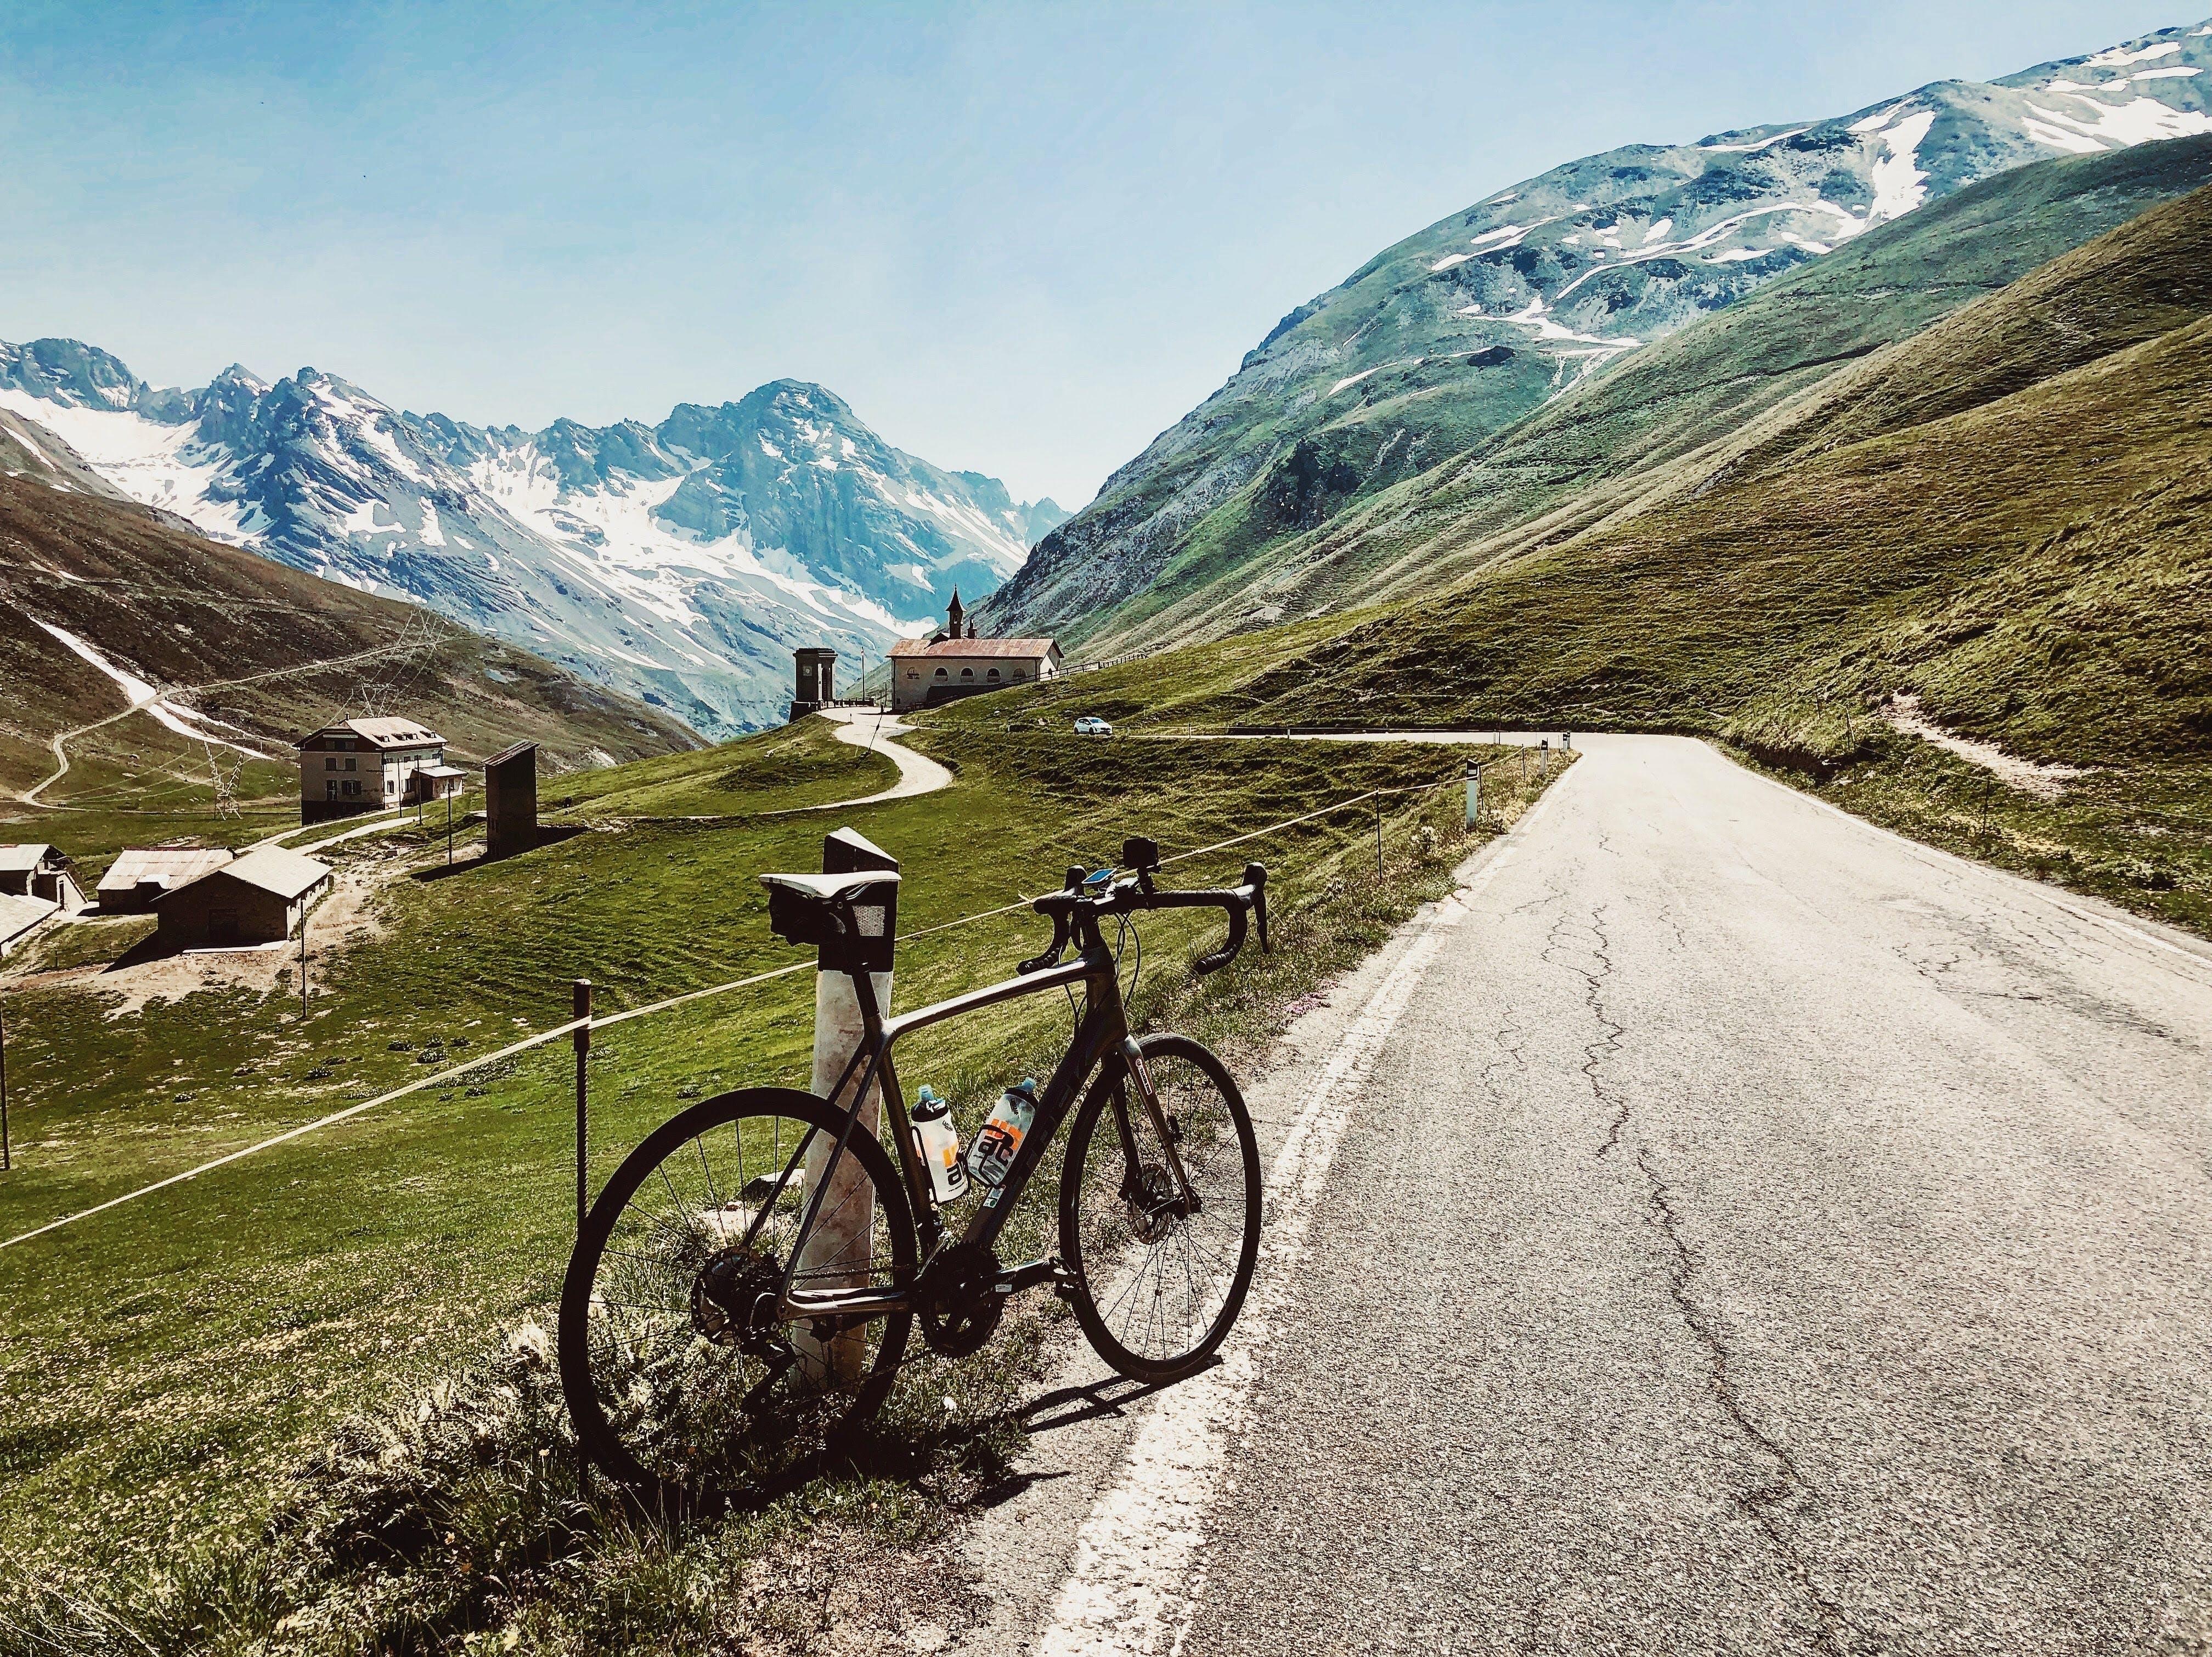 Ascent of Stelvio Pass, Italy